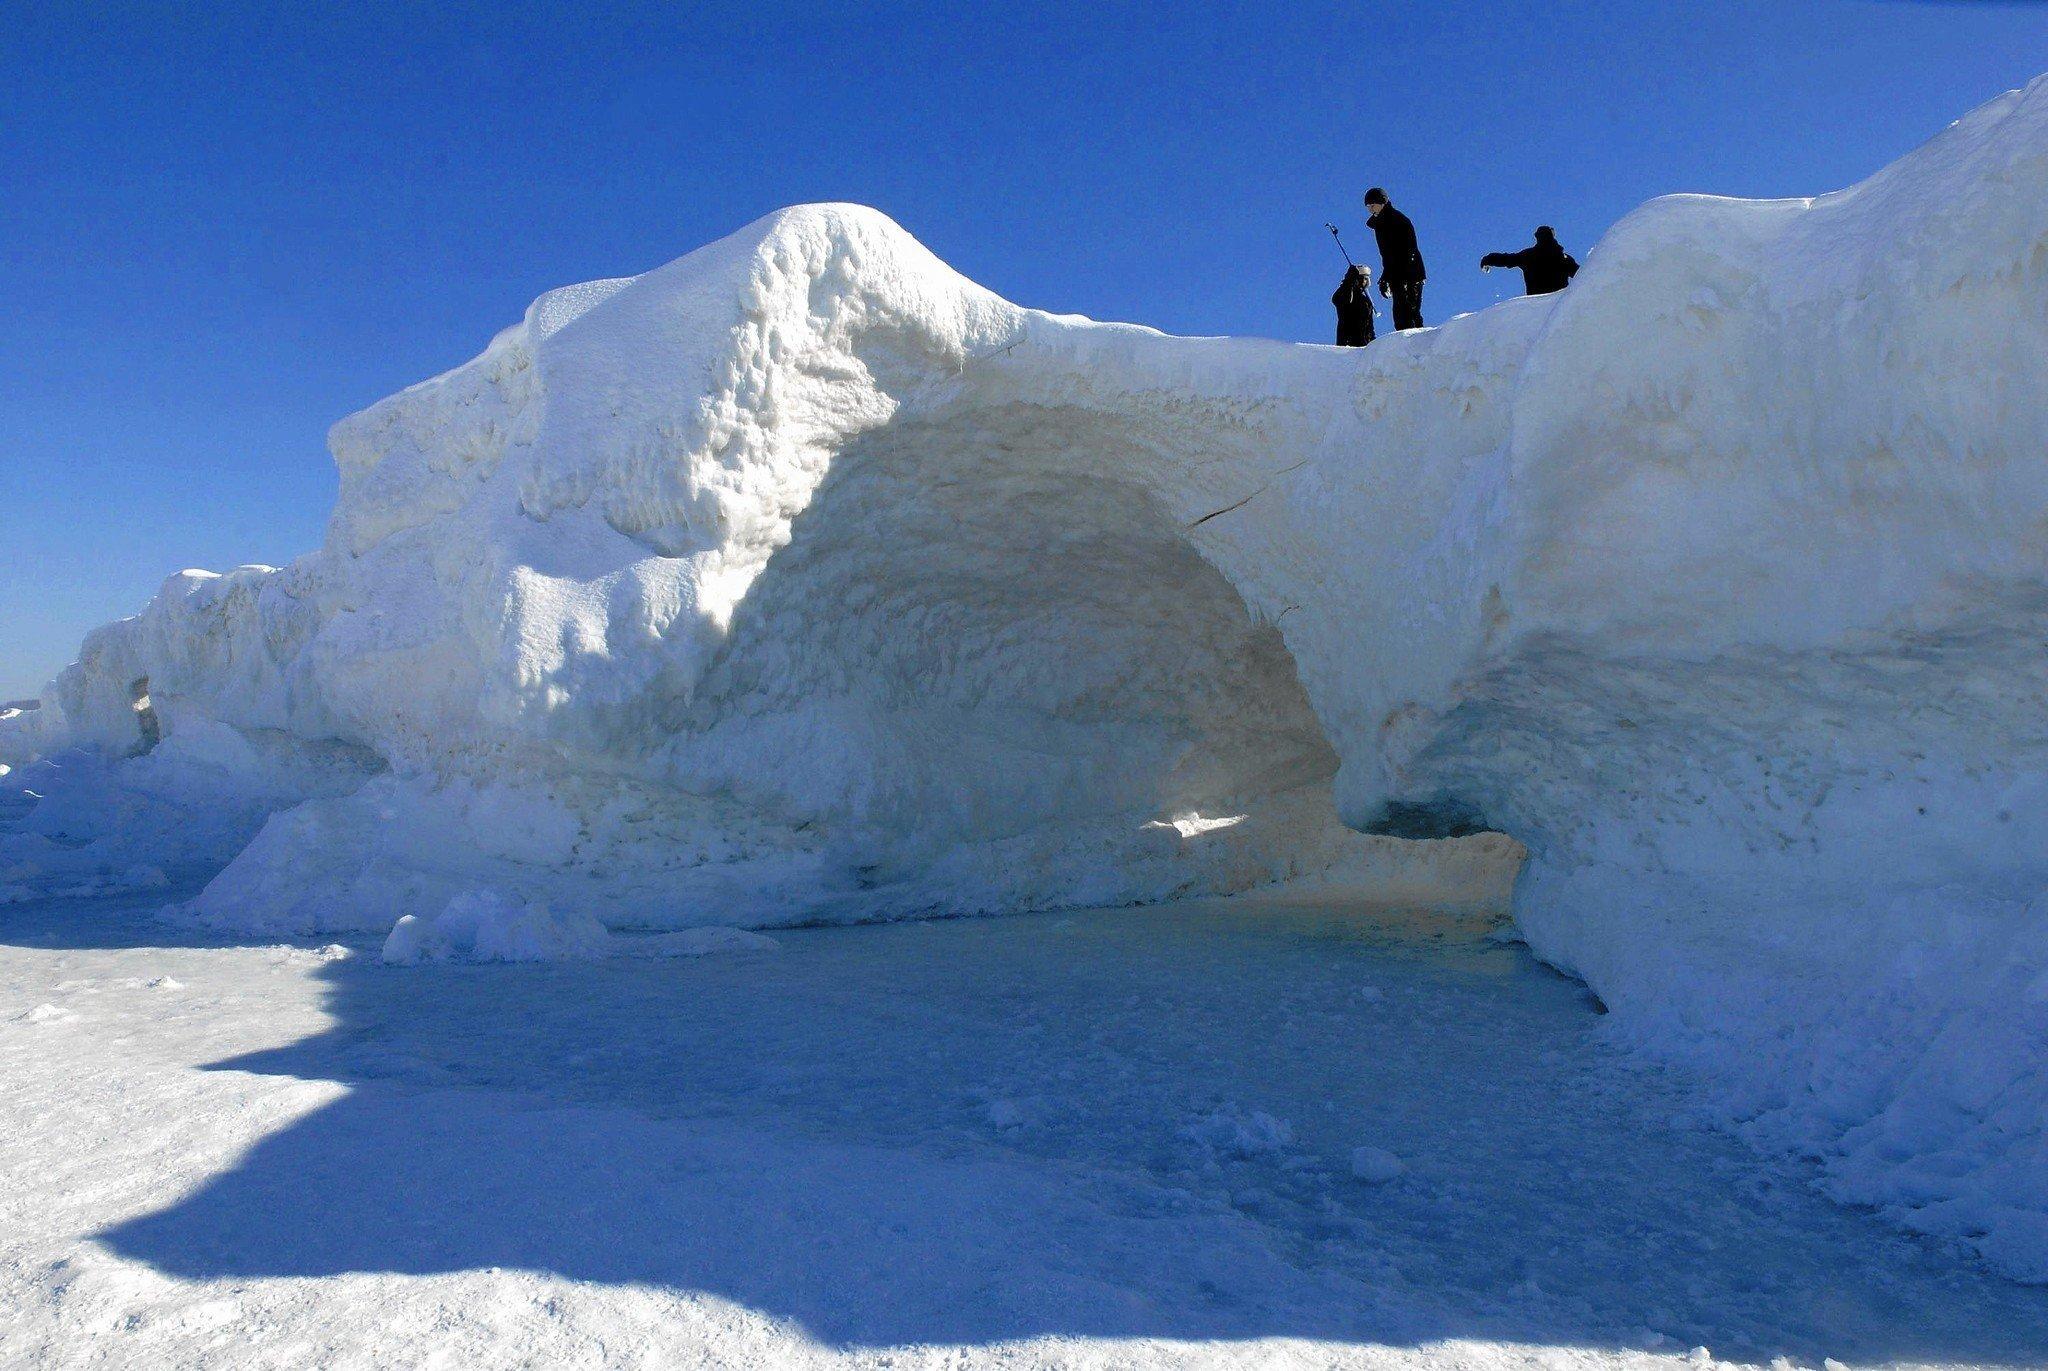 919f2f4d35 Leelanau Peninsula in winter a quiet and worthy escape - Chicago Tribune